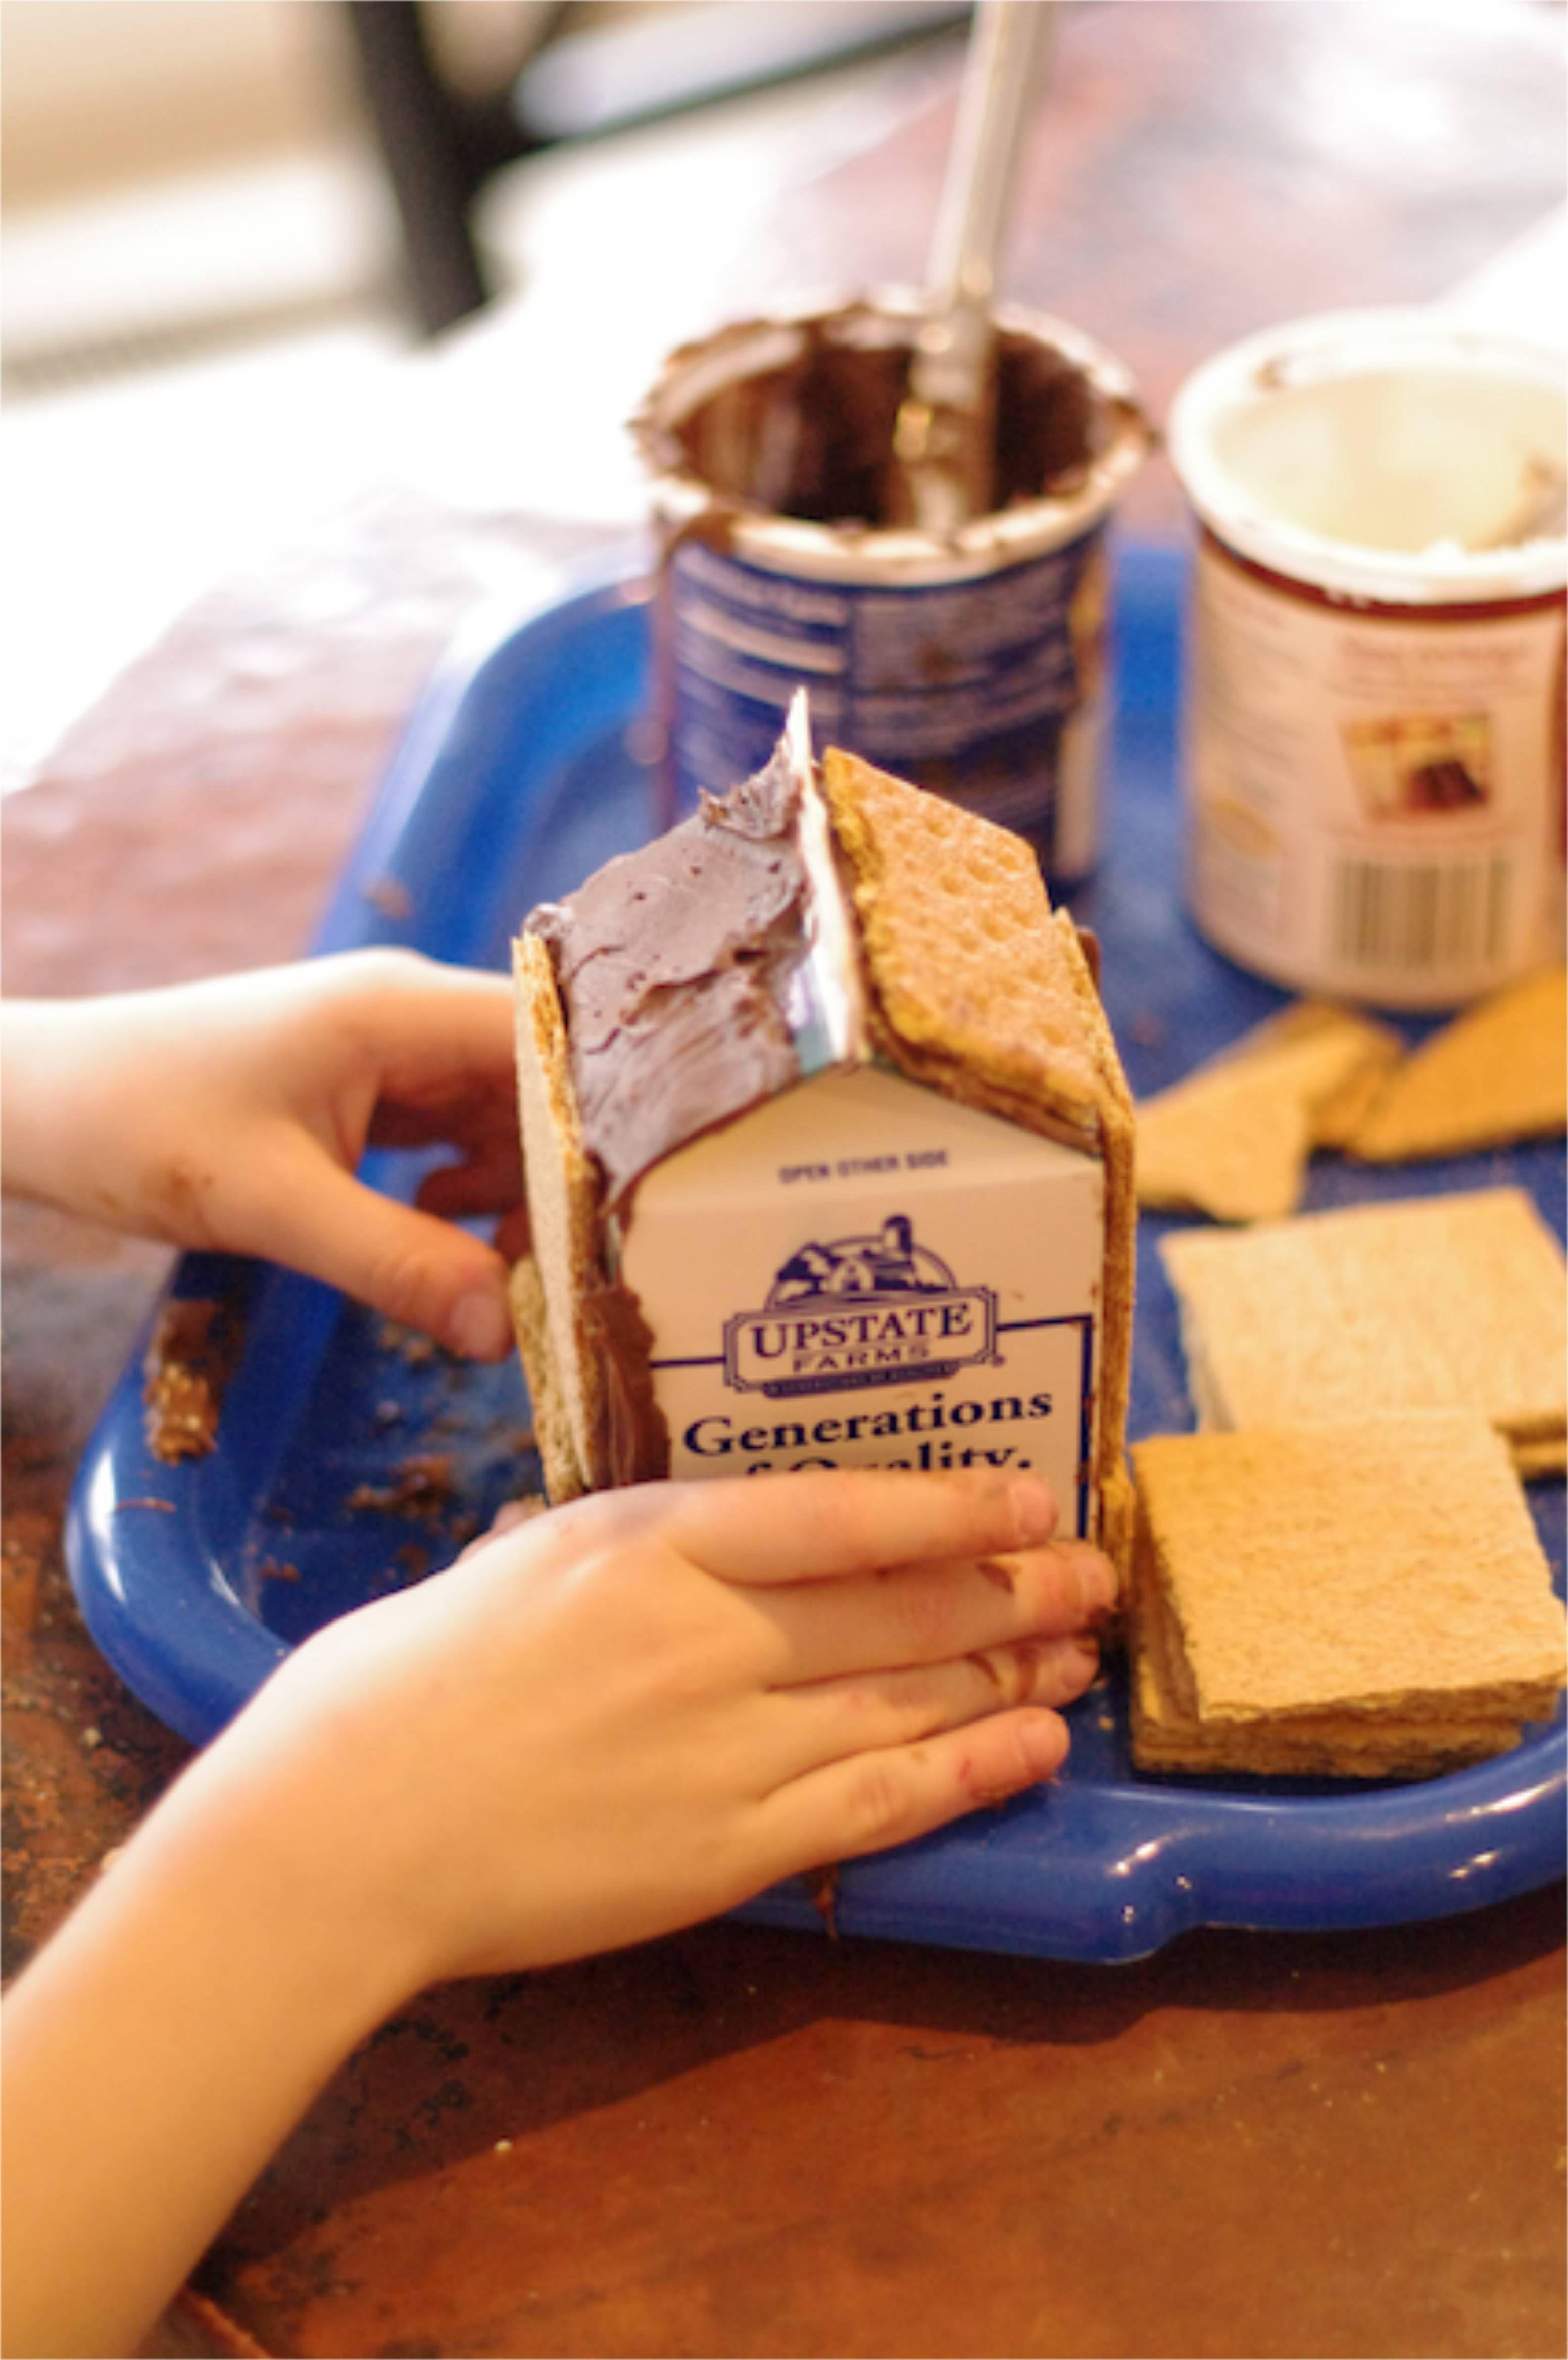 How To Make Milk Carton Gingerbread Houses